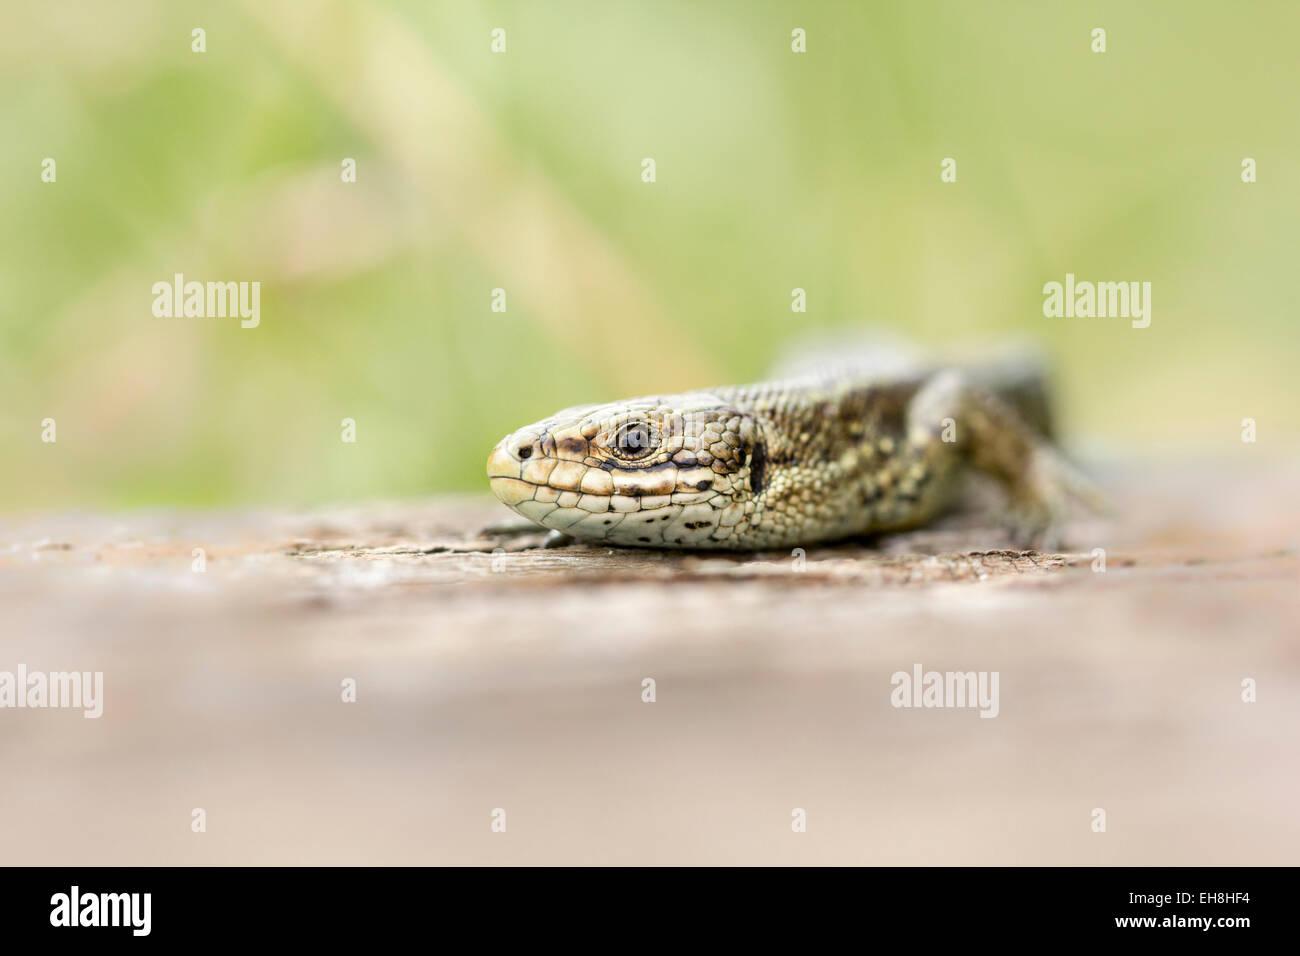 Zootoca vivipara lizard basking in the sun. - Stock Image